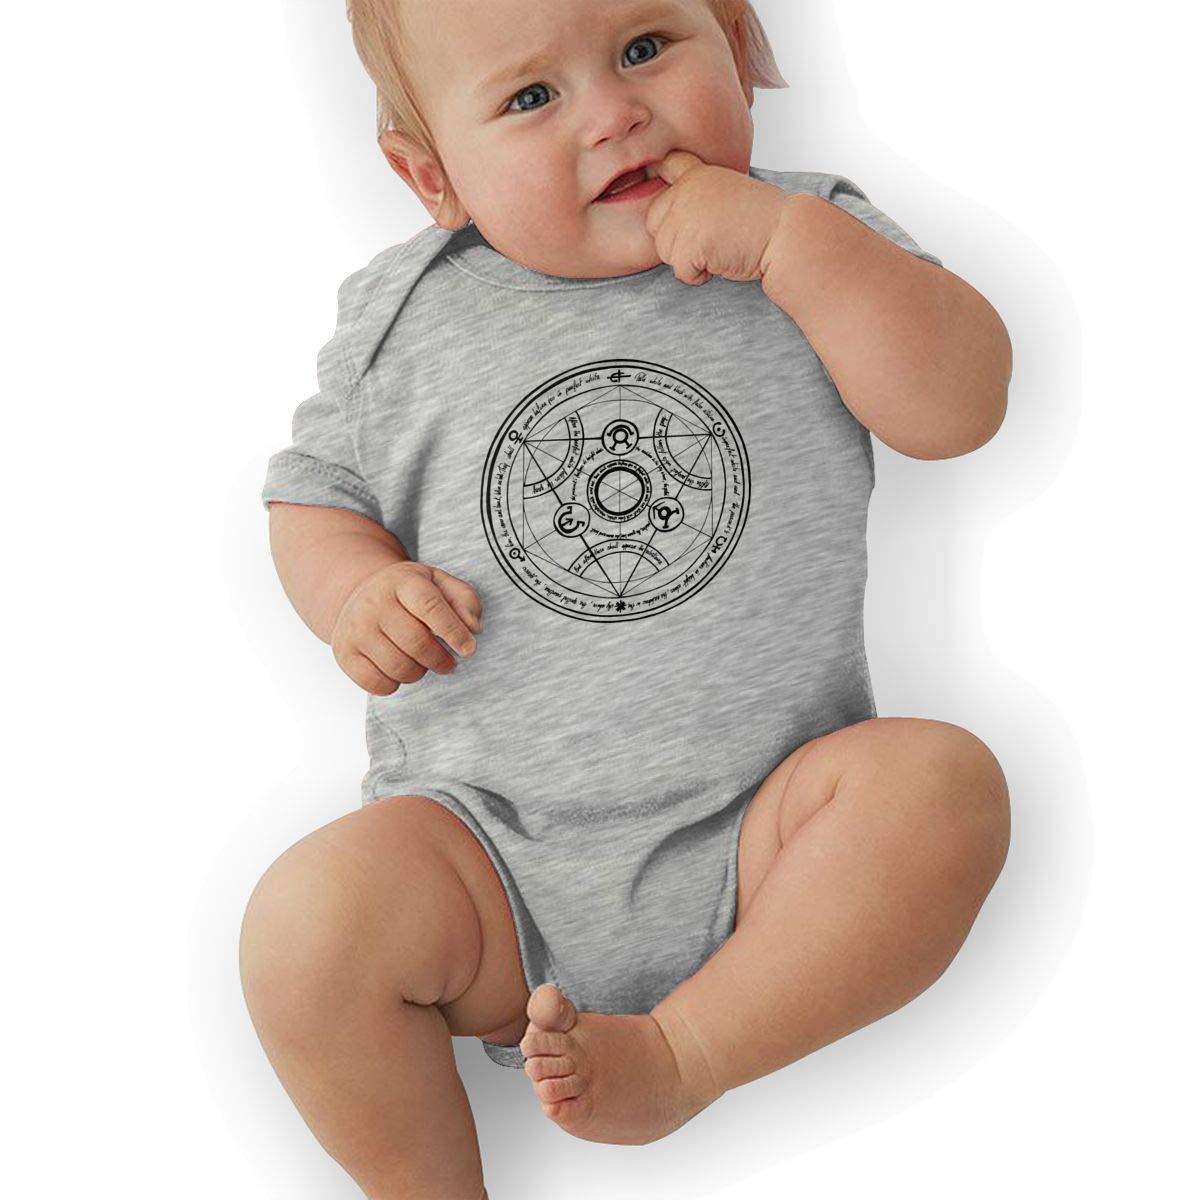 HappyLifea Ten Zetsu Ren Hatsu Baby Pajamas Bodysuits Clothes Onesies Jumpsuits Outfits Gray